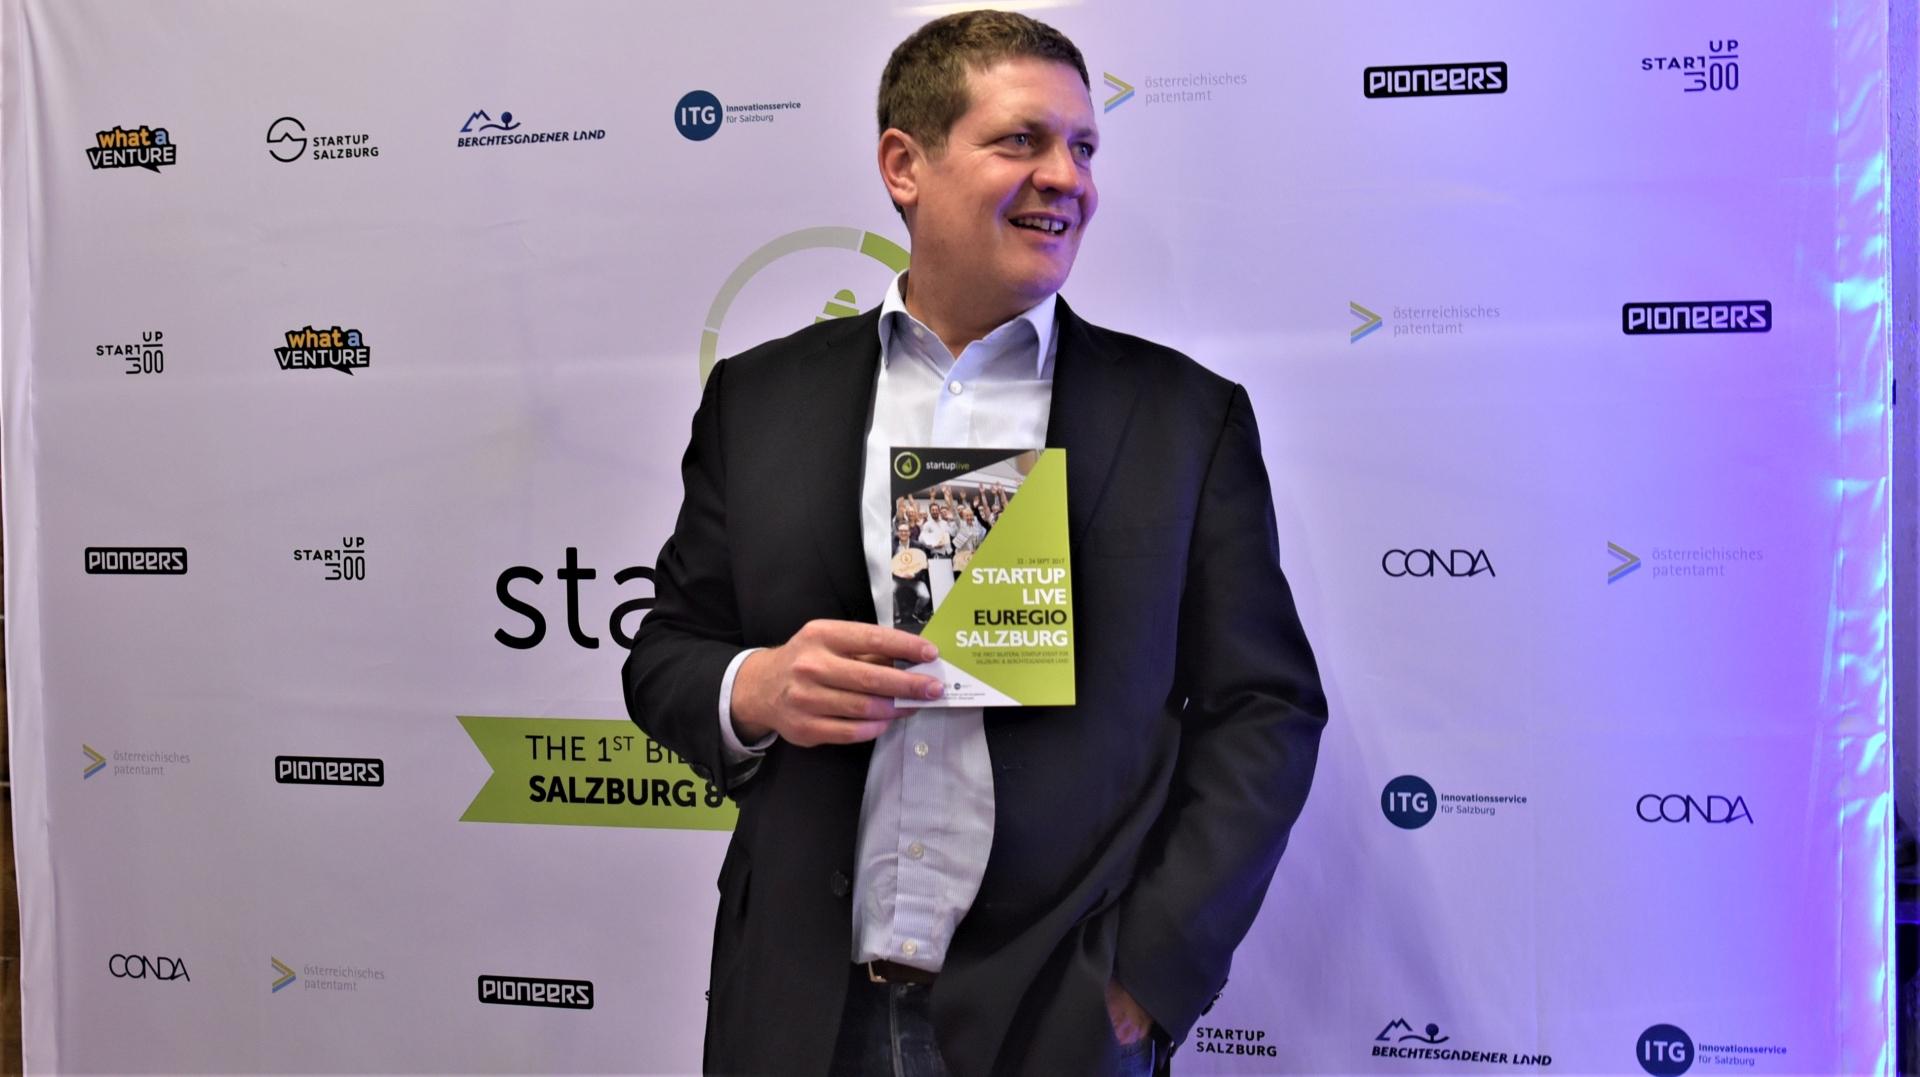 Lars beim Startup